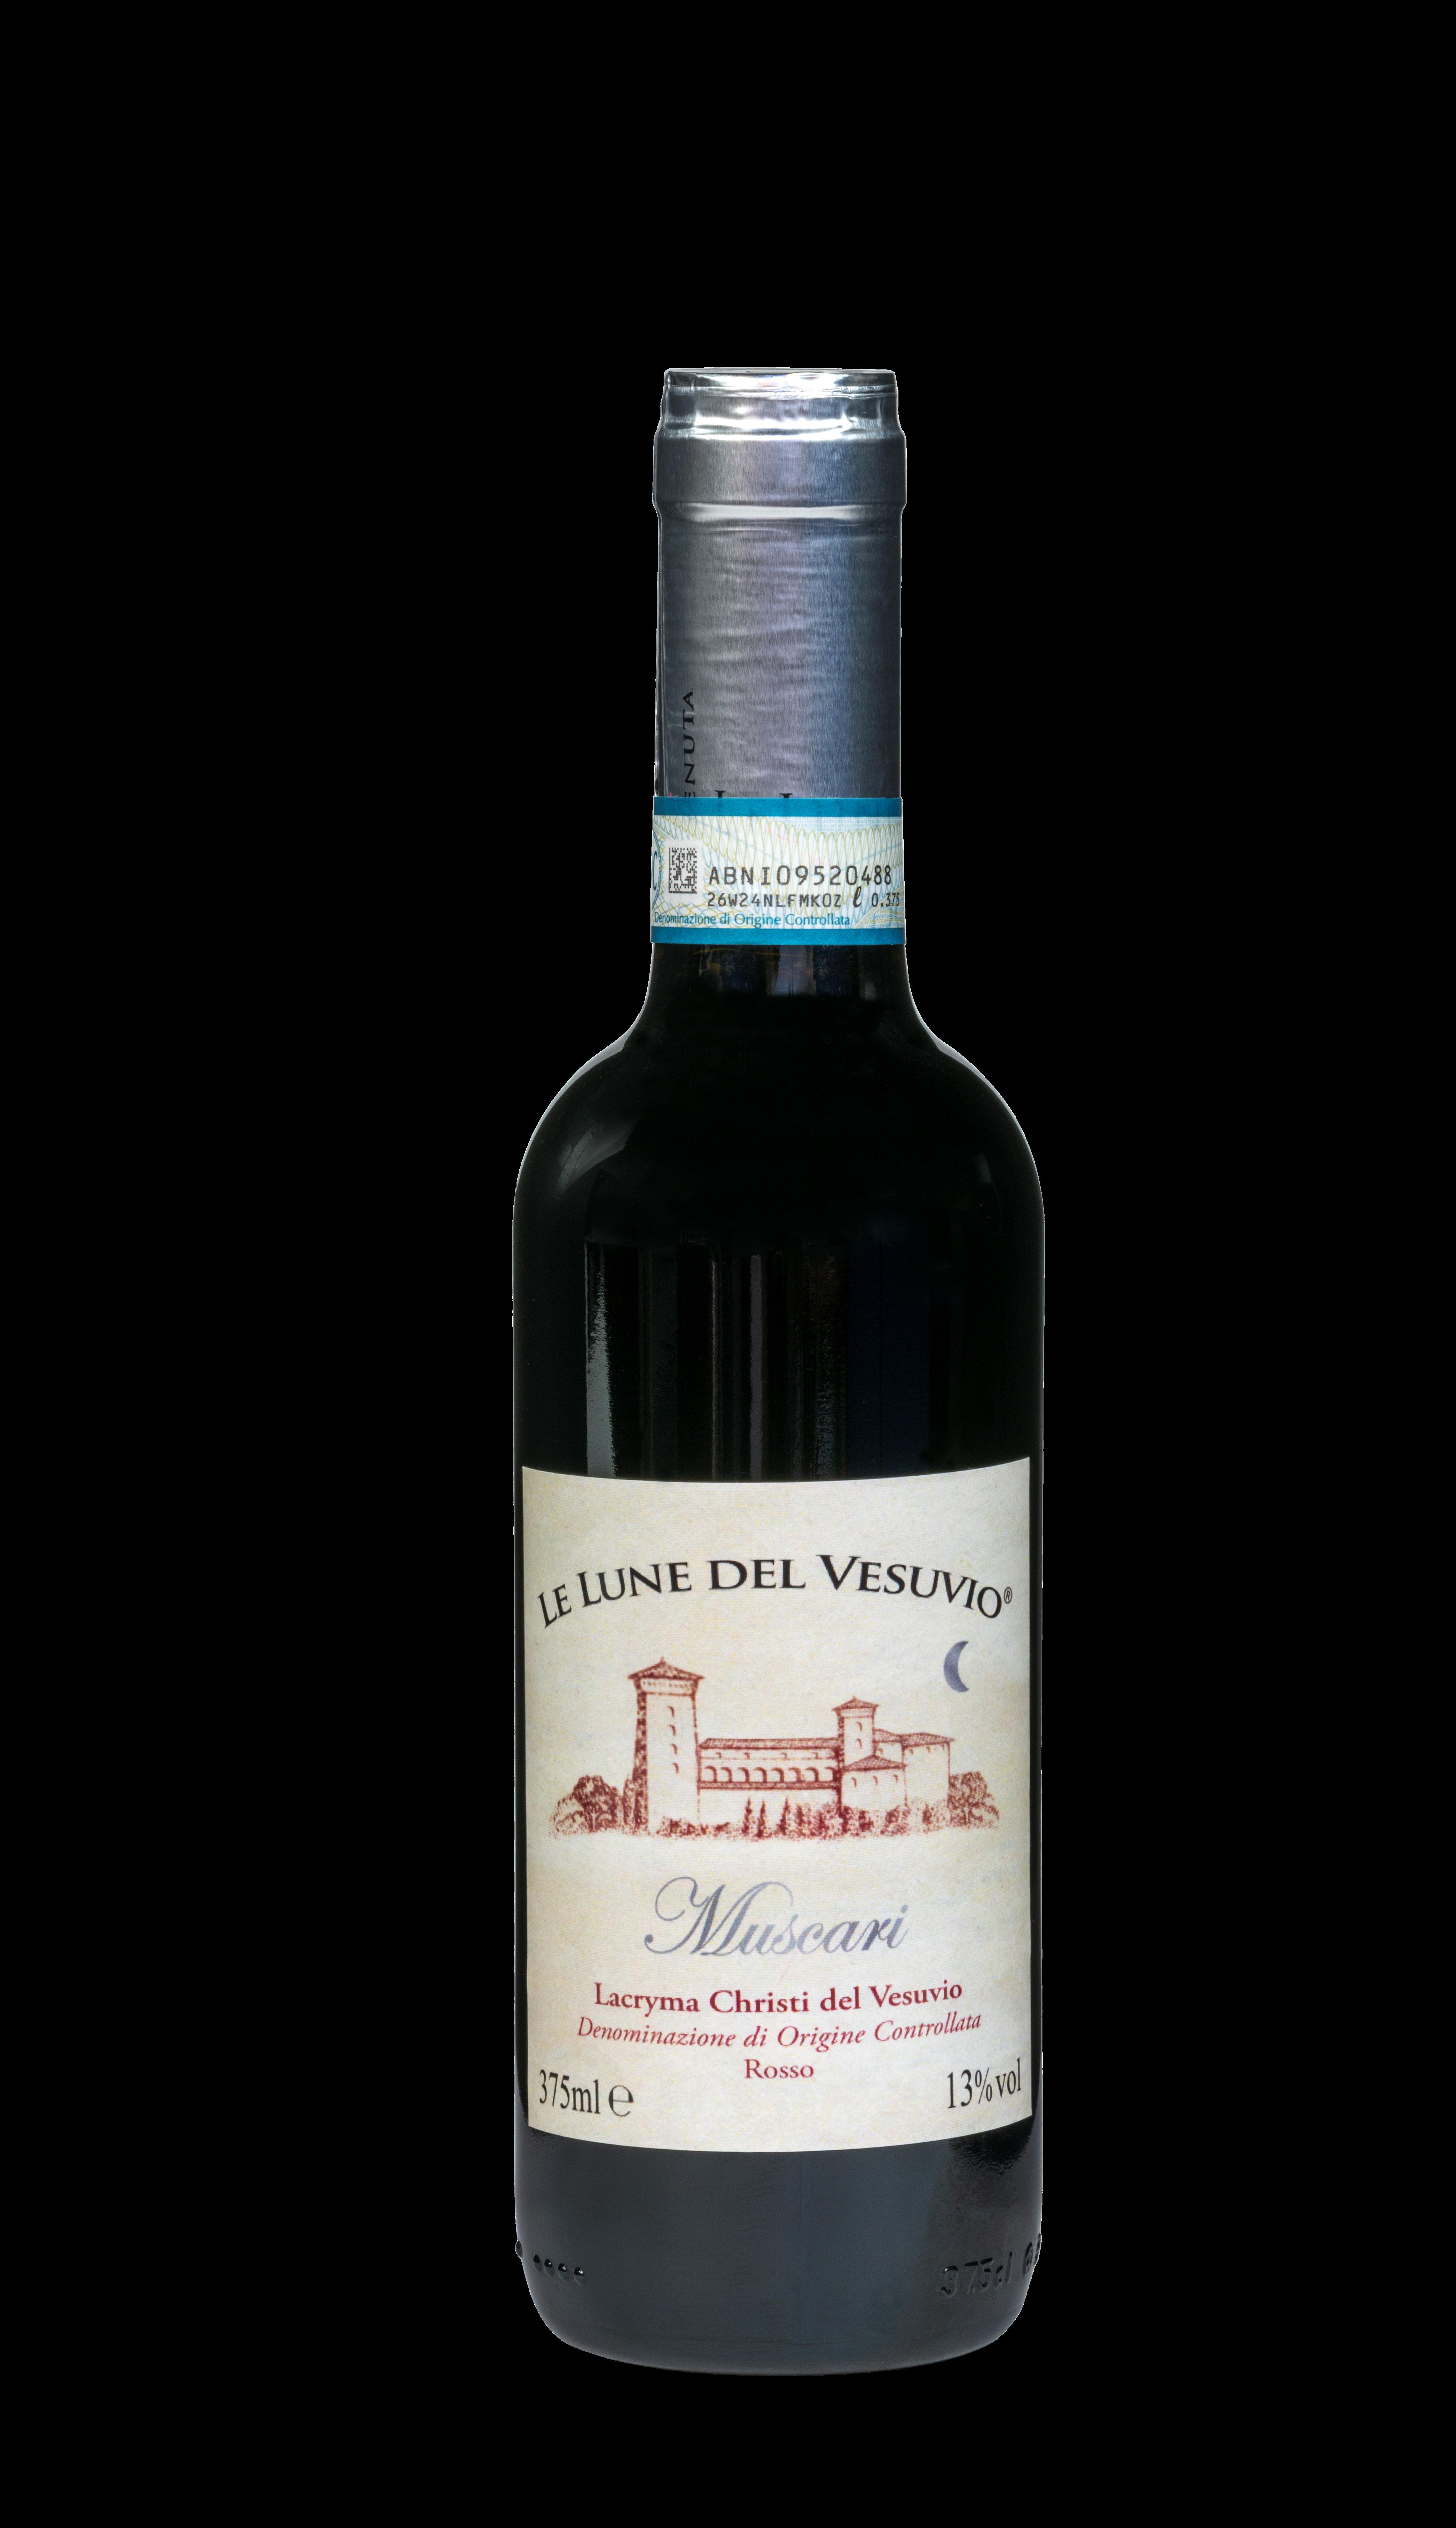 Muscari Italiaanse rode wijn Lacryma Christi